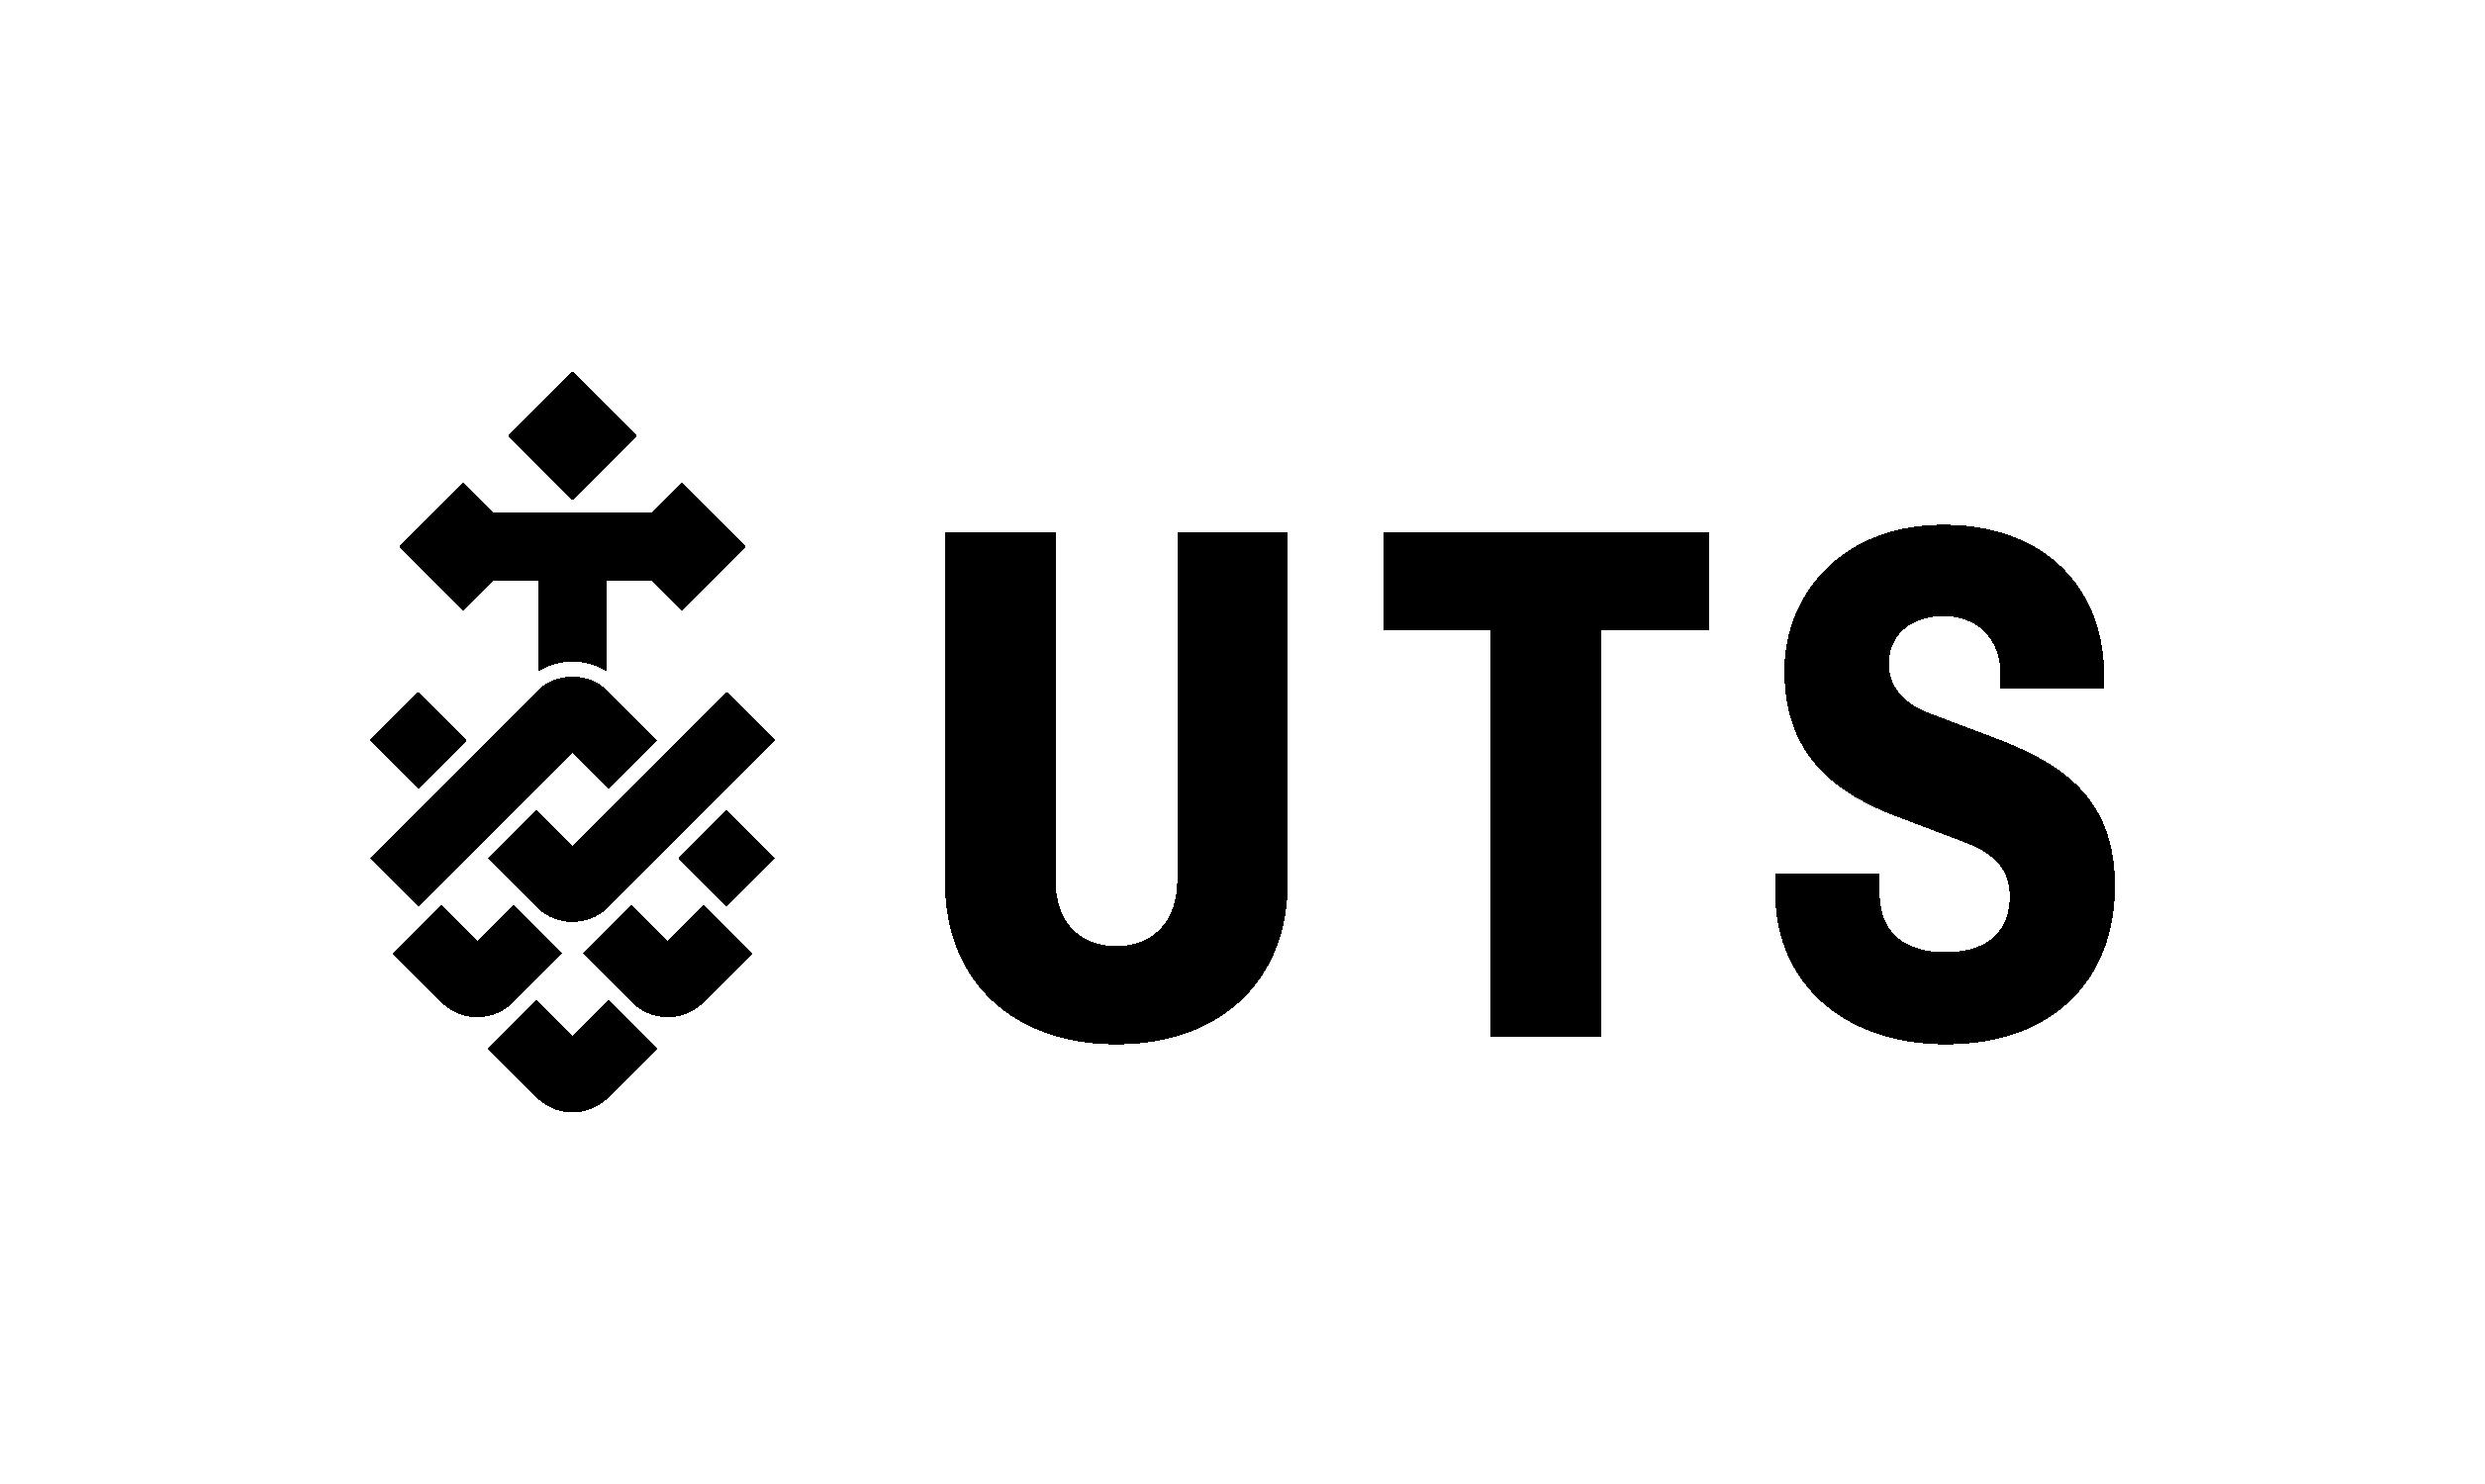 Nimish-Biloria's logo